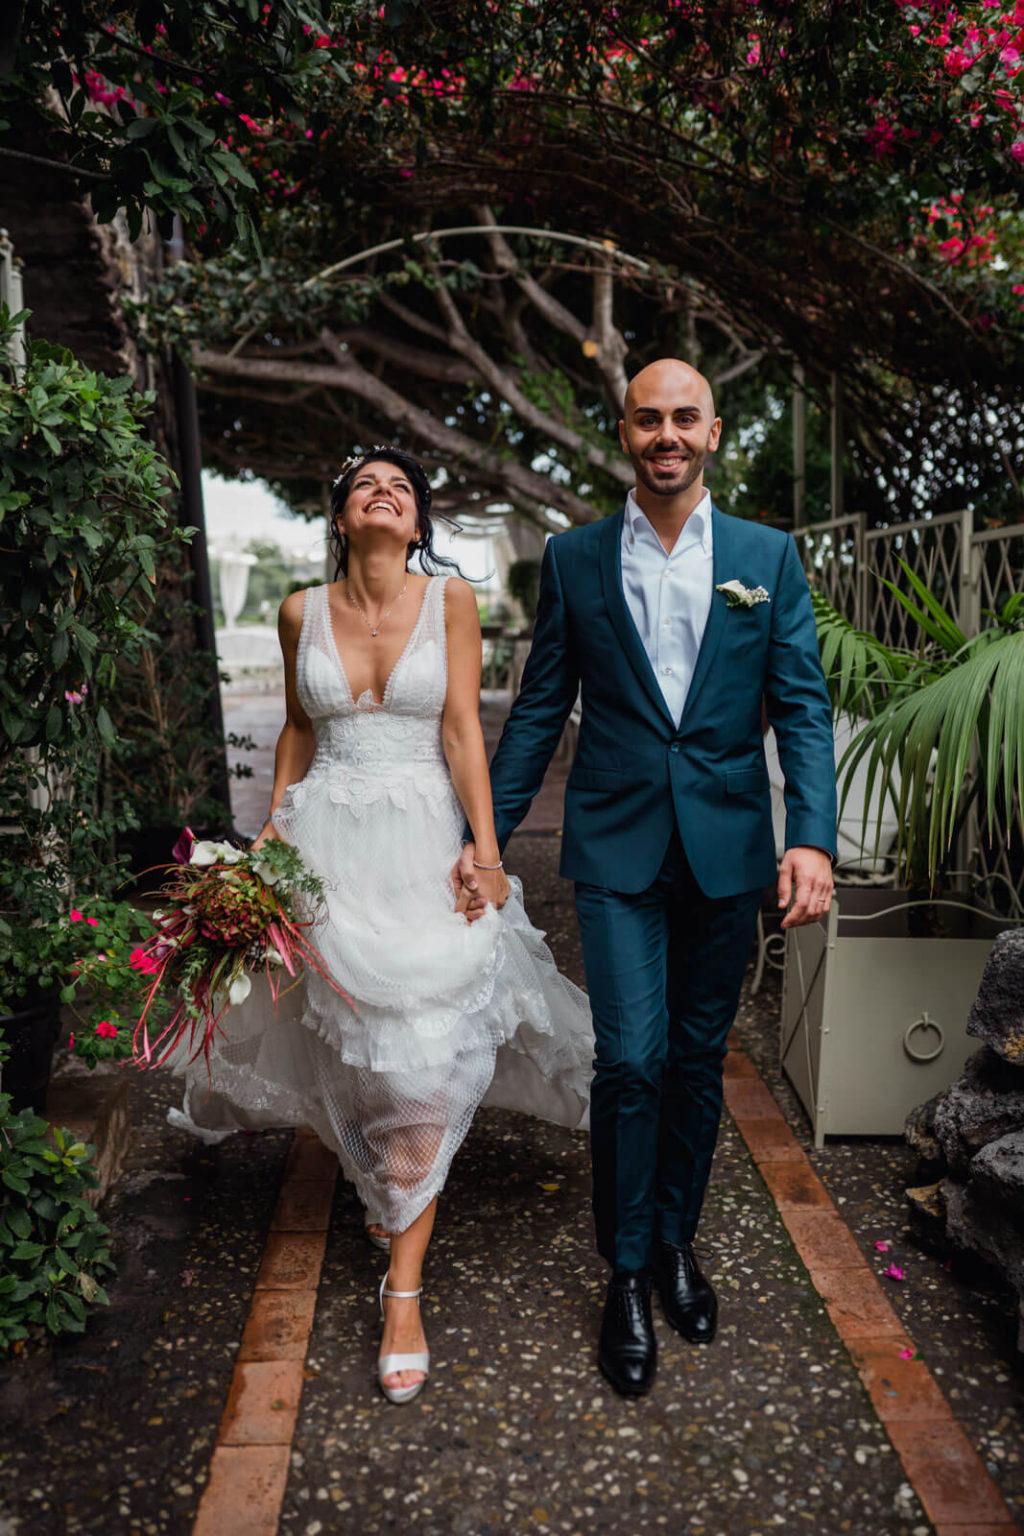 Destination Wedding Photographer Sicily Italy Barcelona Spain Anna Svobodova